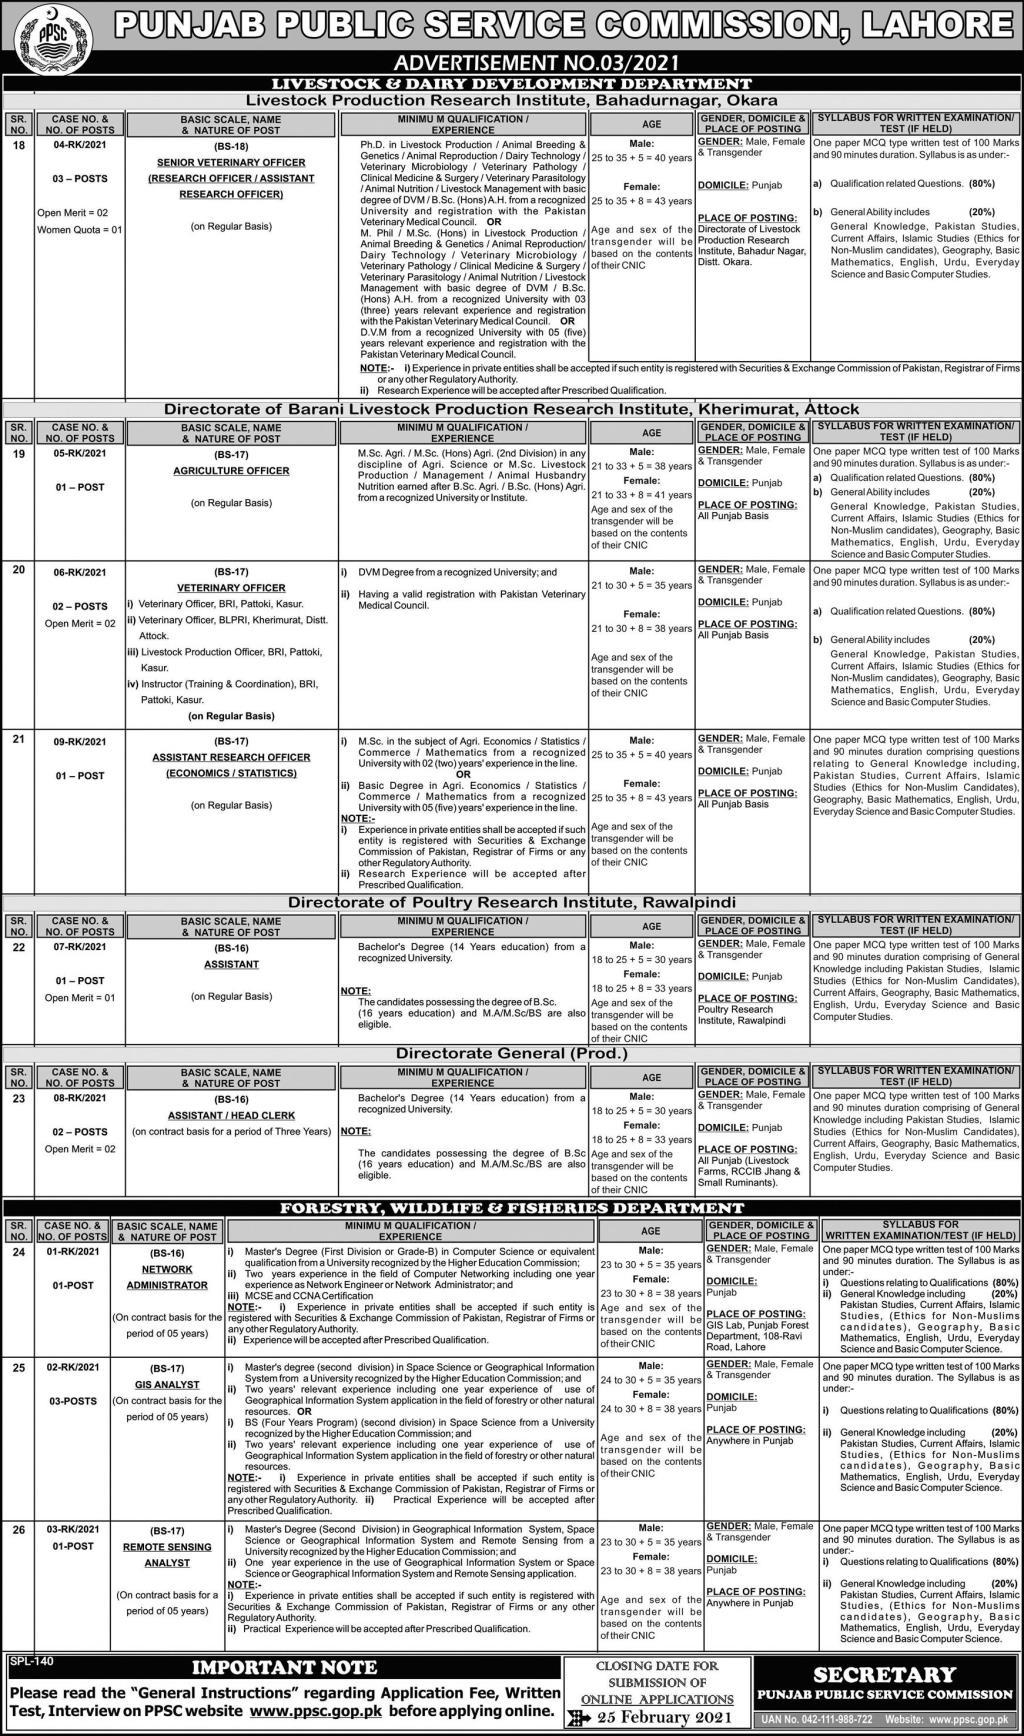 How to Apply PPSC Jobs 2021 - PPSC New Jobs - PPSC Latest Jobs - PPSC Jobs Today - PPSC Online Apply - PPSC Job Pk - PBSC Jobs - PPSC Jobs in Pakistan